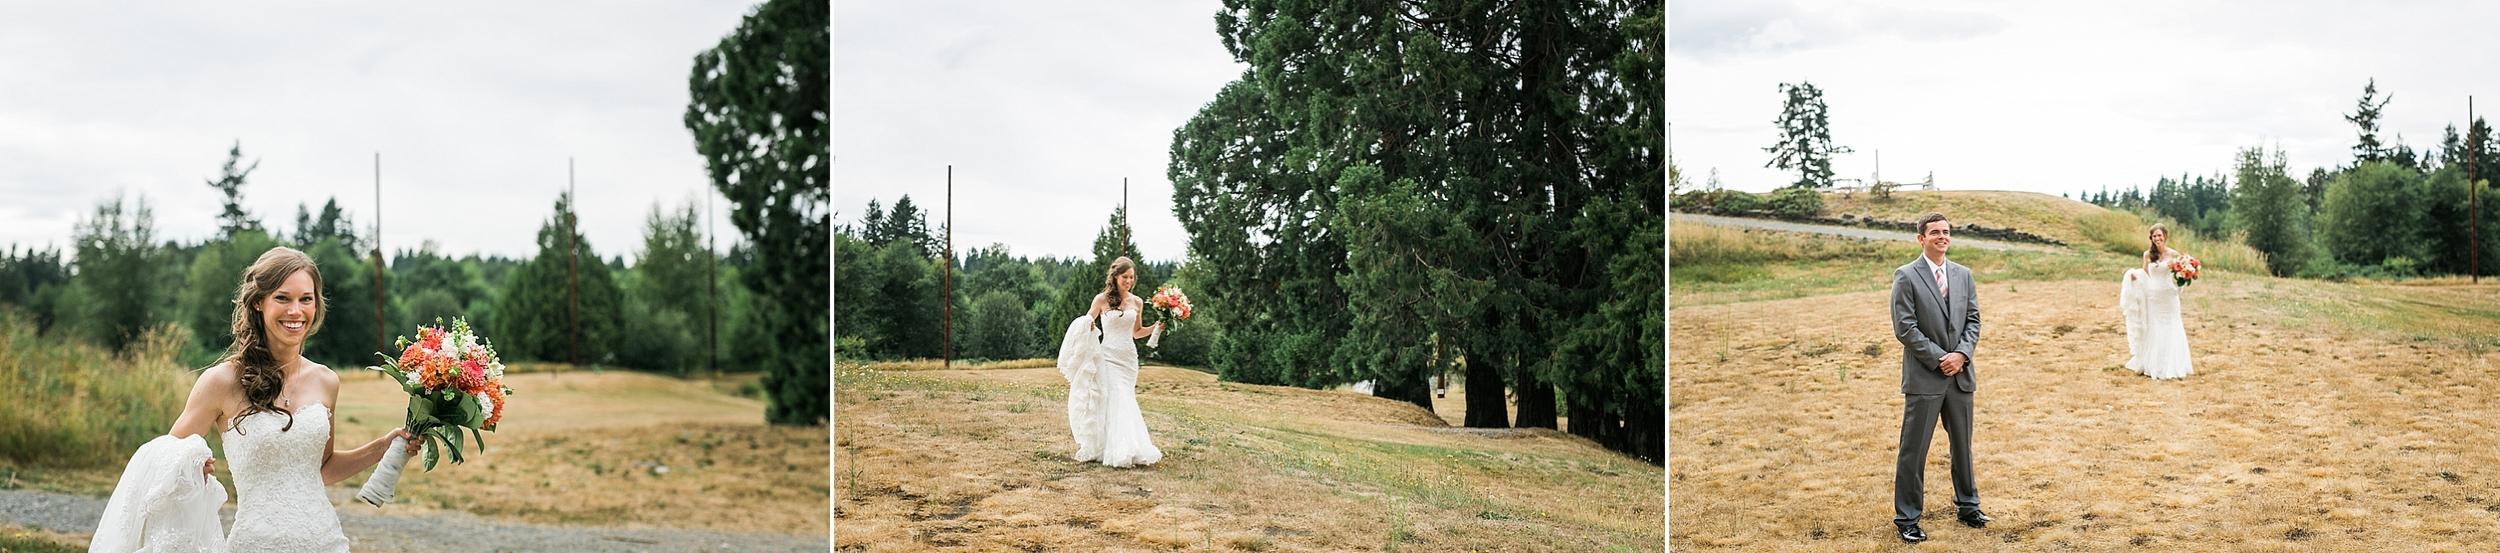 ashley vos photography seattle area wedding photographer_0649.jpg